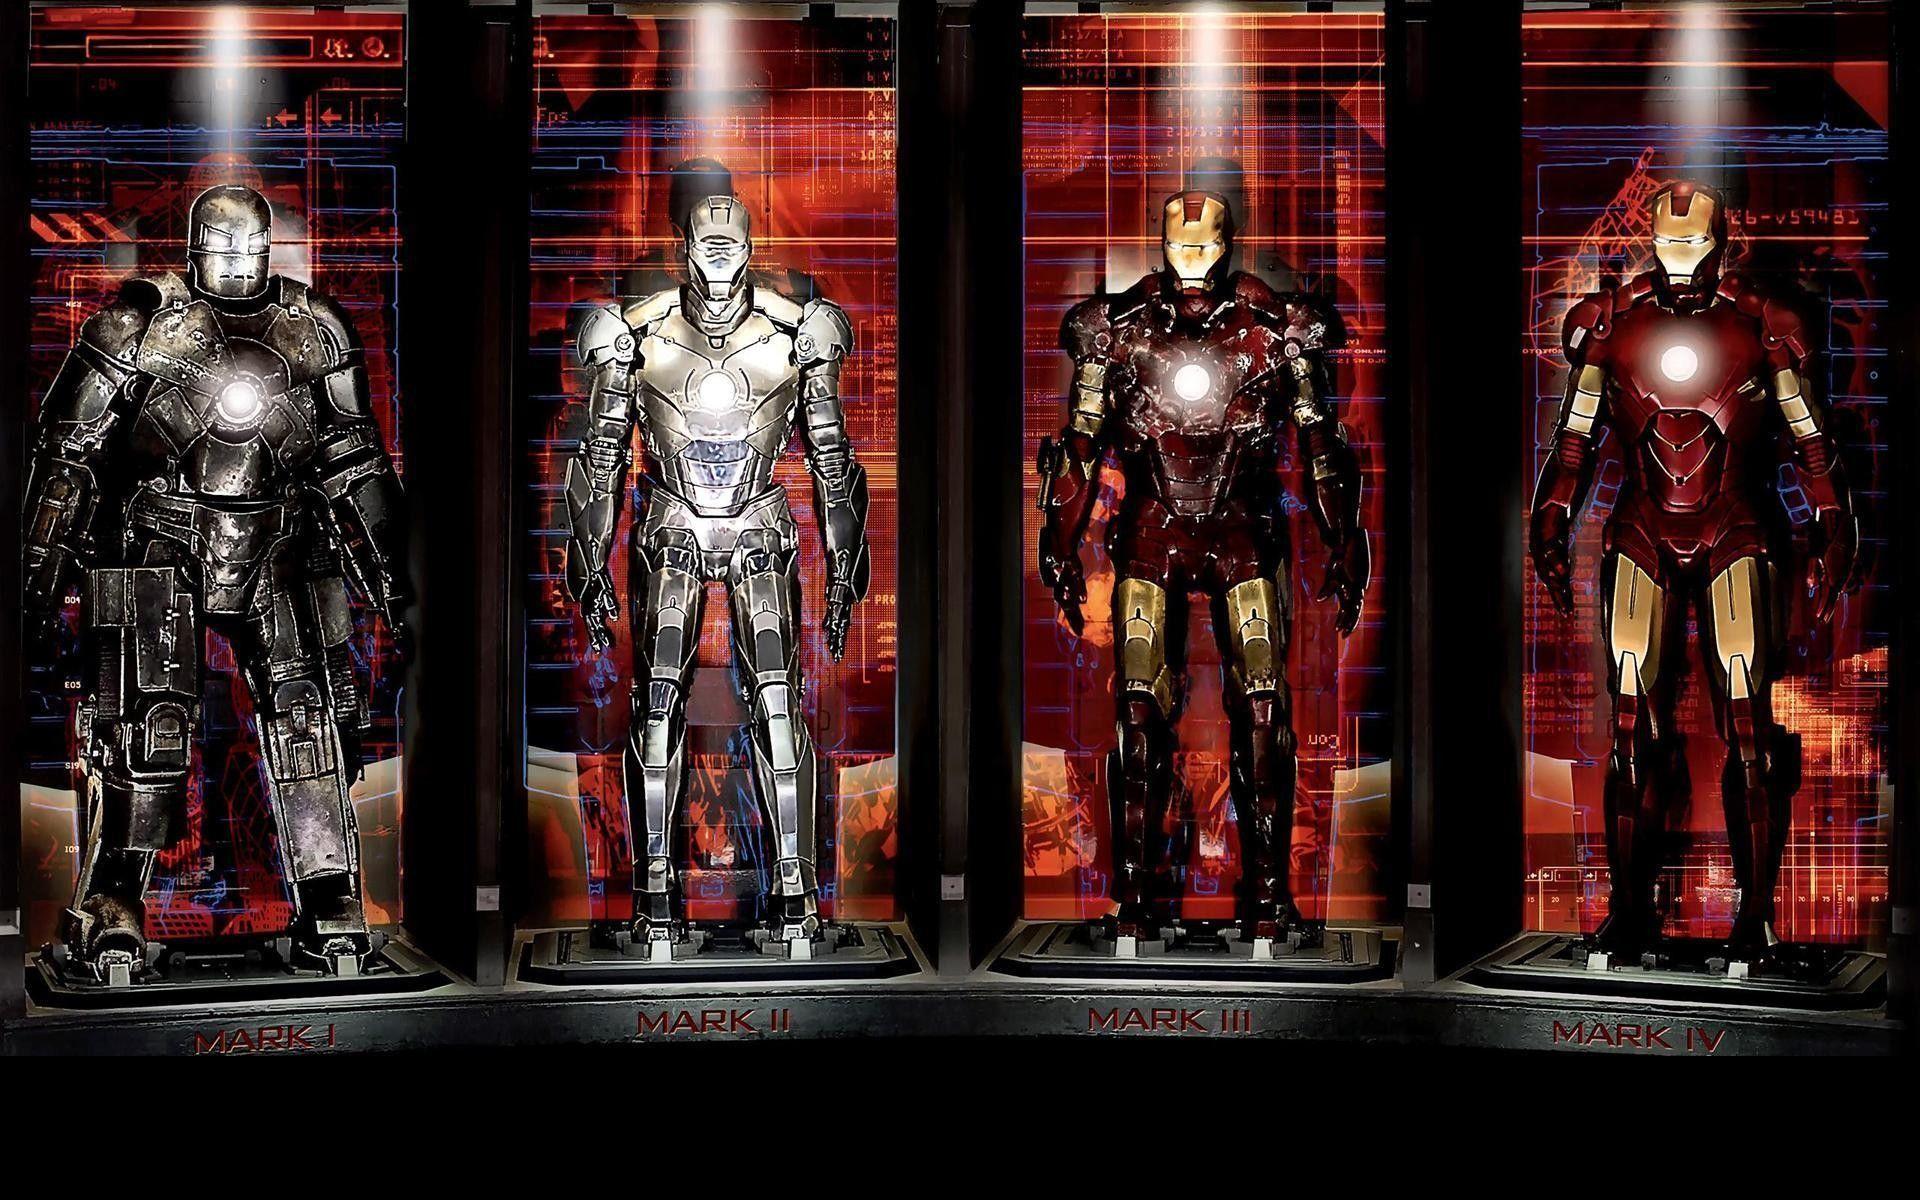 iron man wallpaper in hd